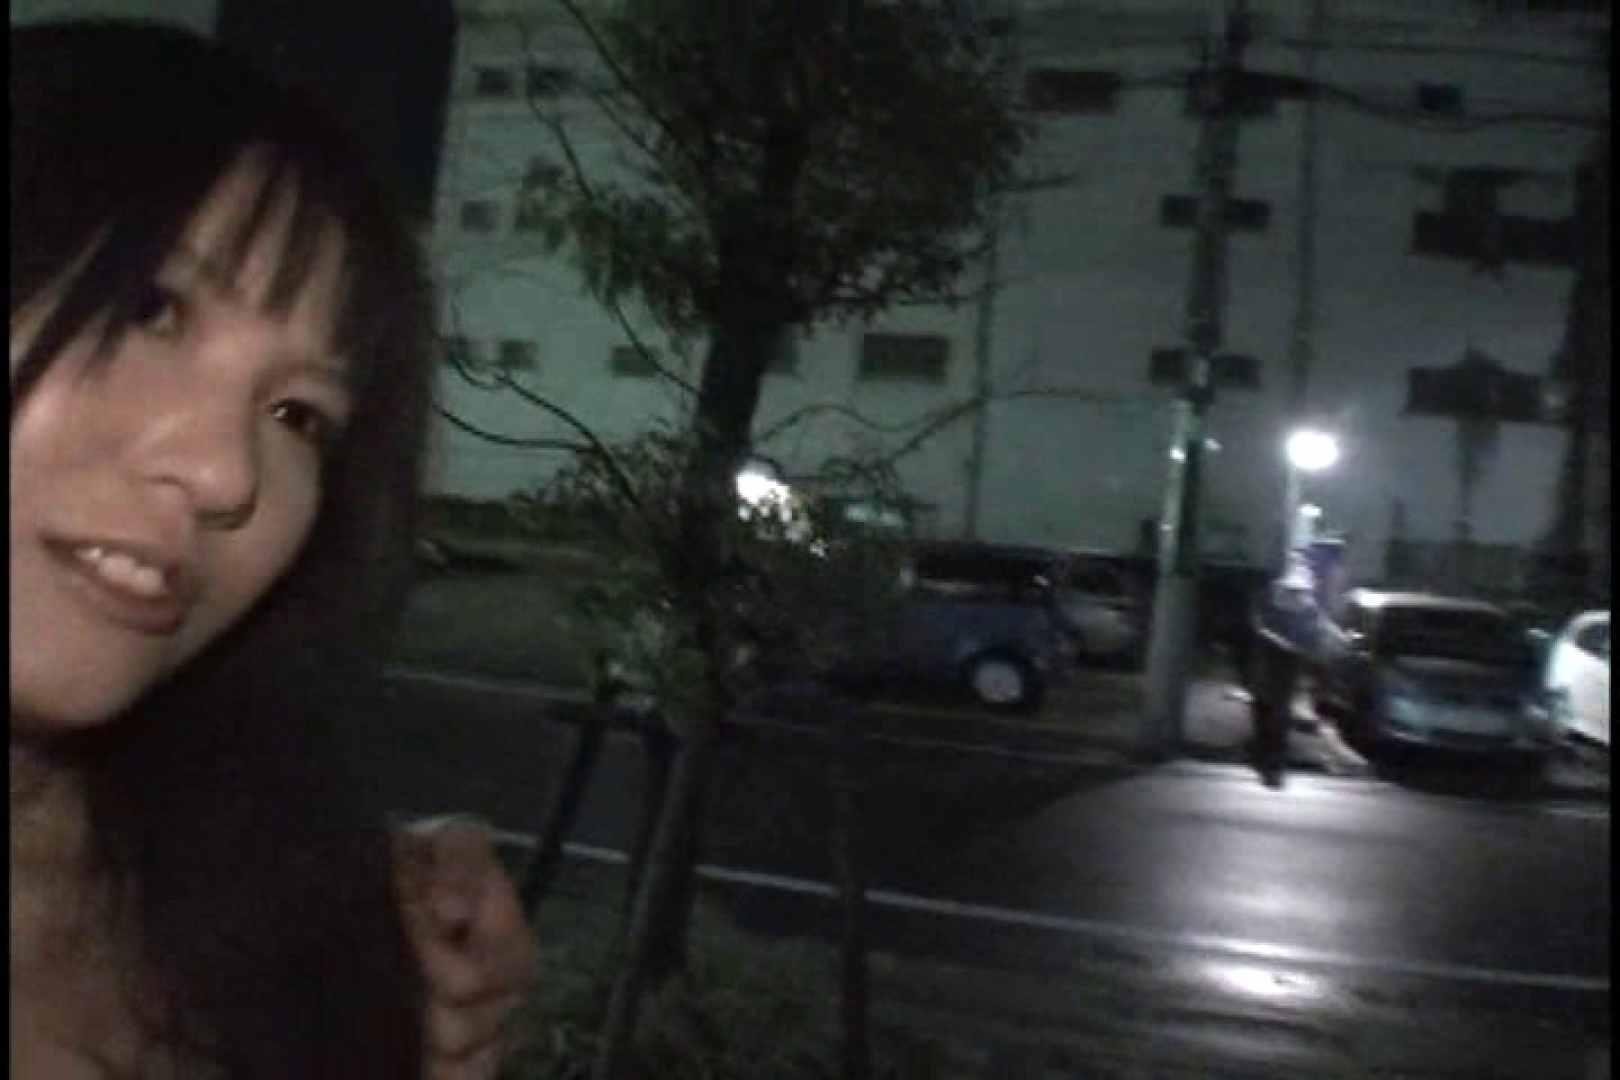 JDハンター全国ツアー vol.028 後編 女子大生のエロ動画   0  111PIX 5